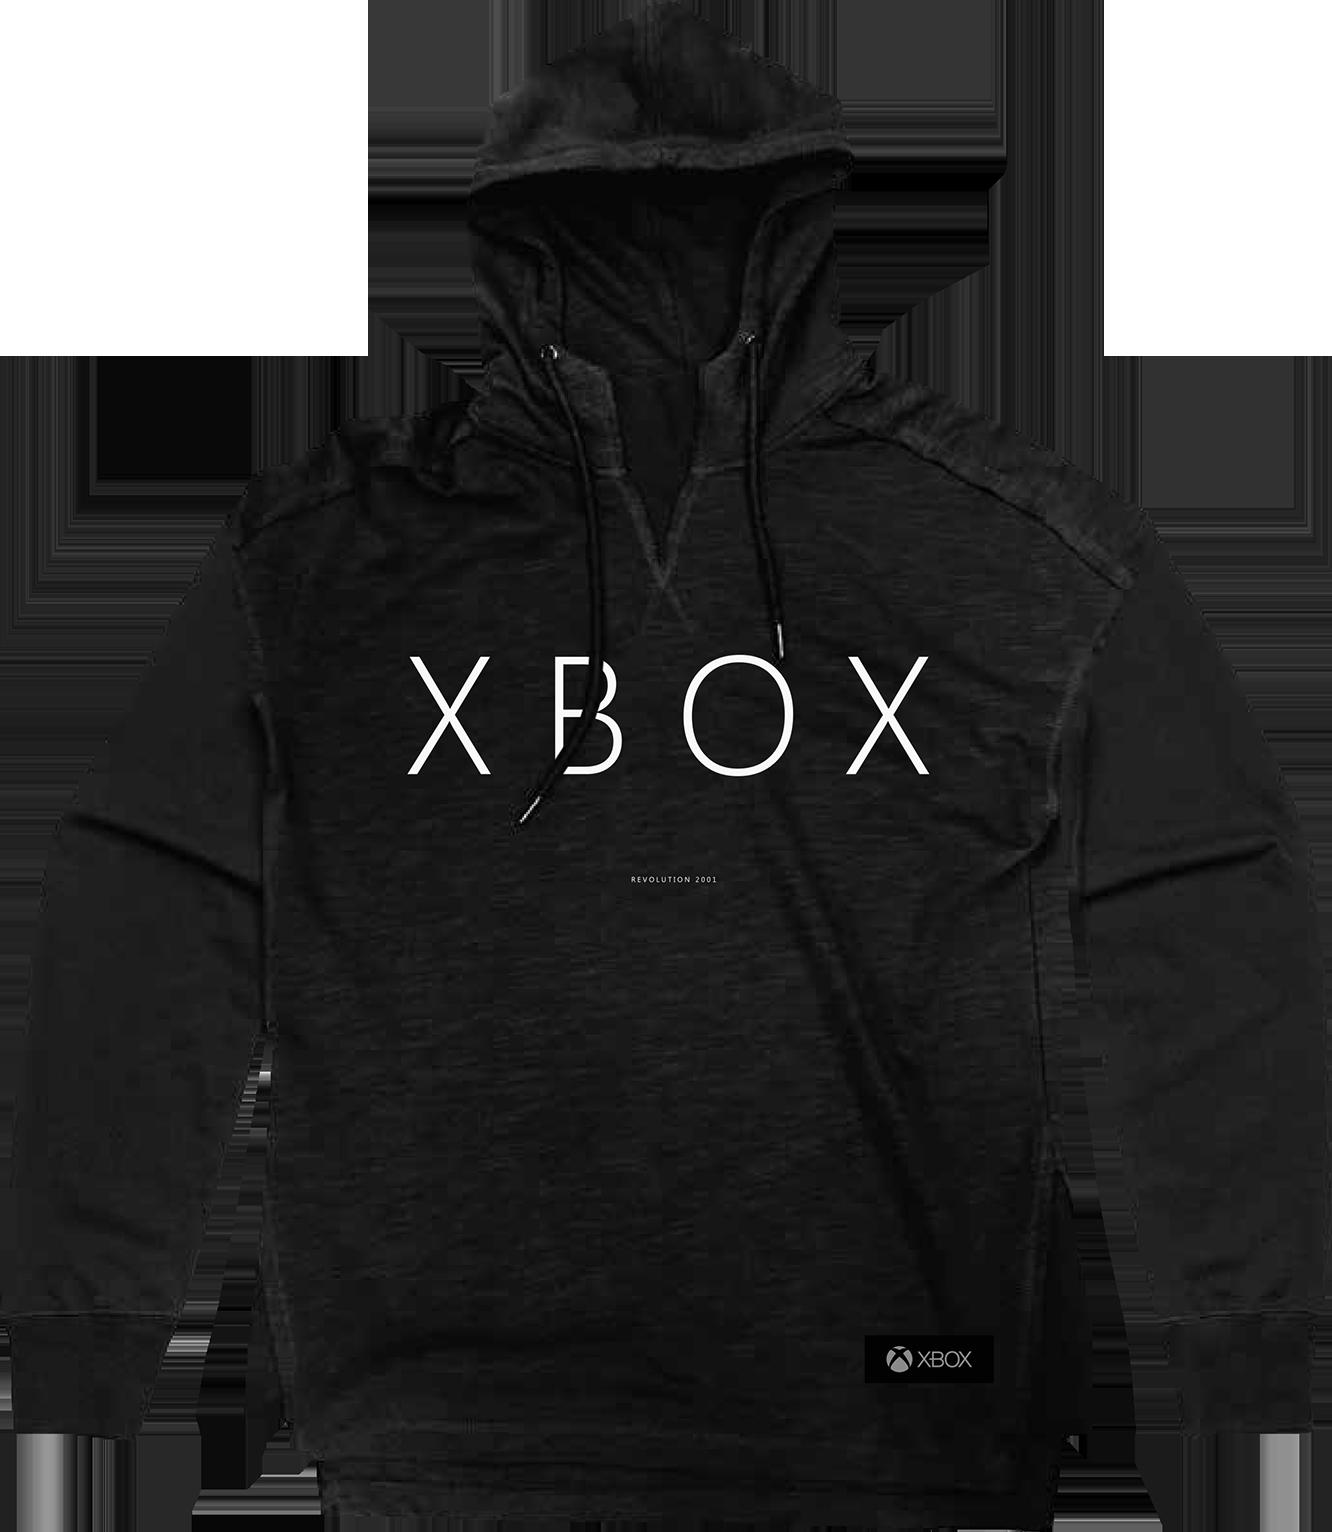 e6a6fc0d237 Buy Linear Hoodie - Microsoft Store